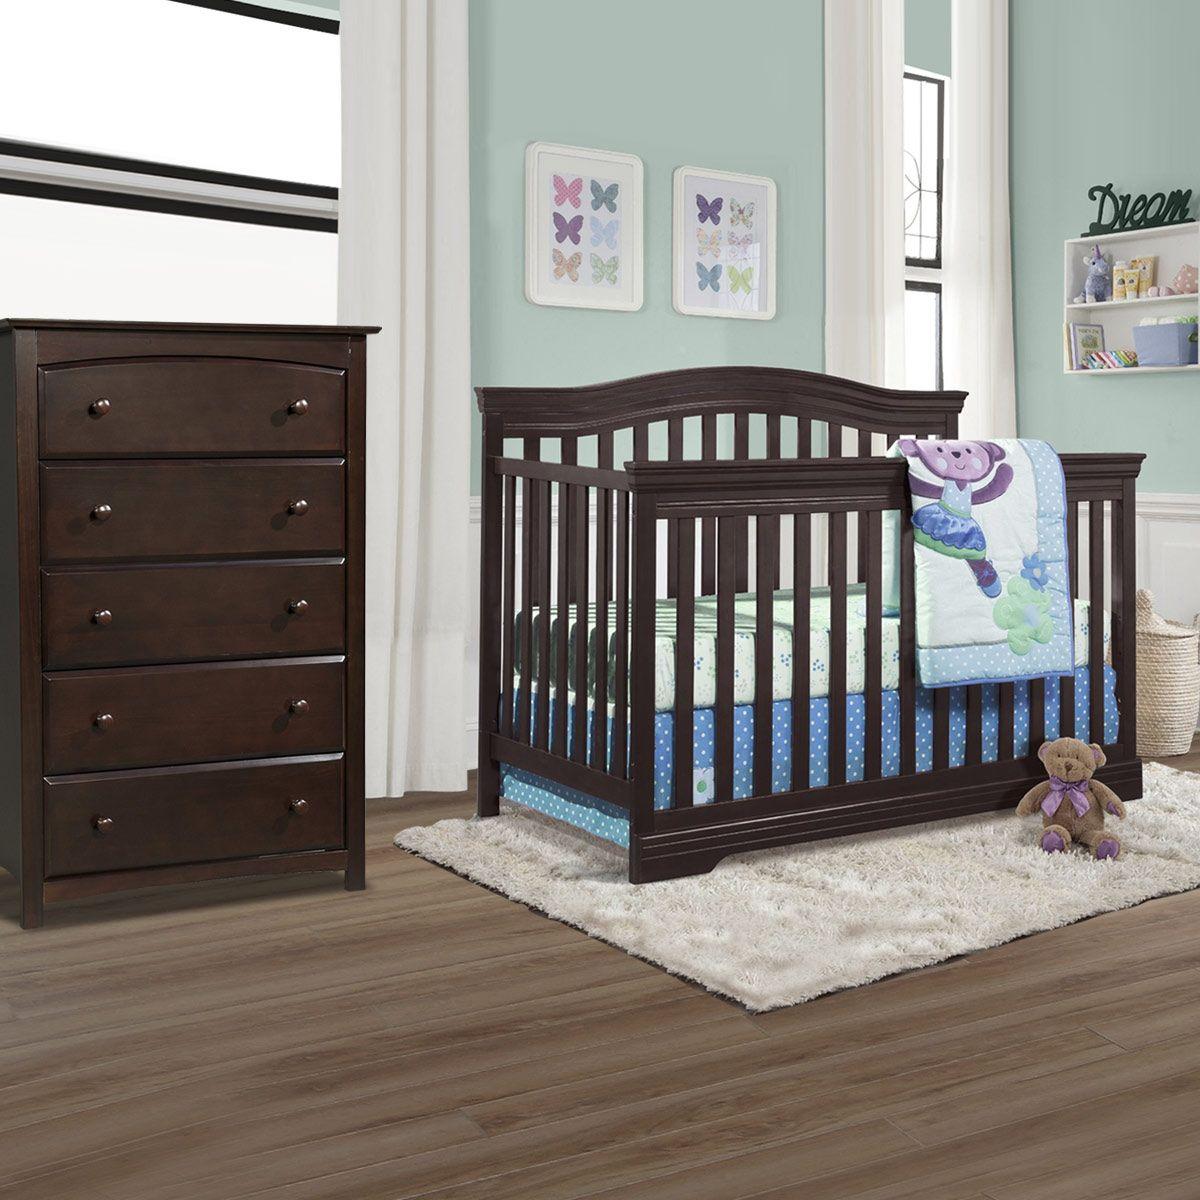 Broyhill Kids Bowen Heights 2 Piece Nursery Set 4 In 1 Convertible Crib